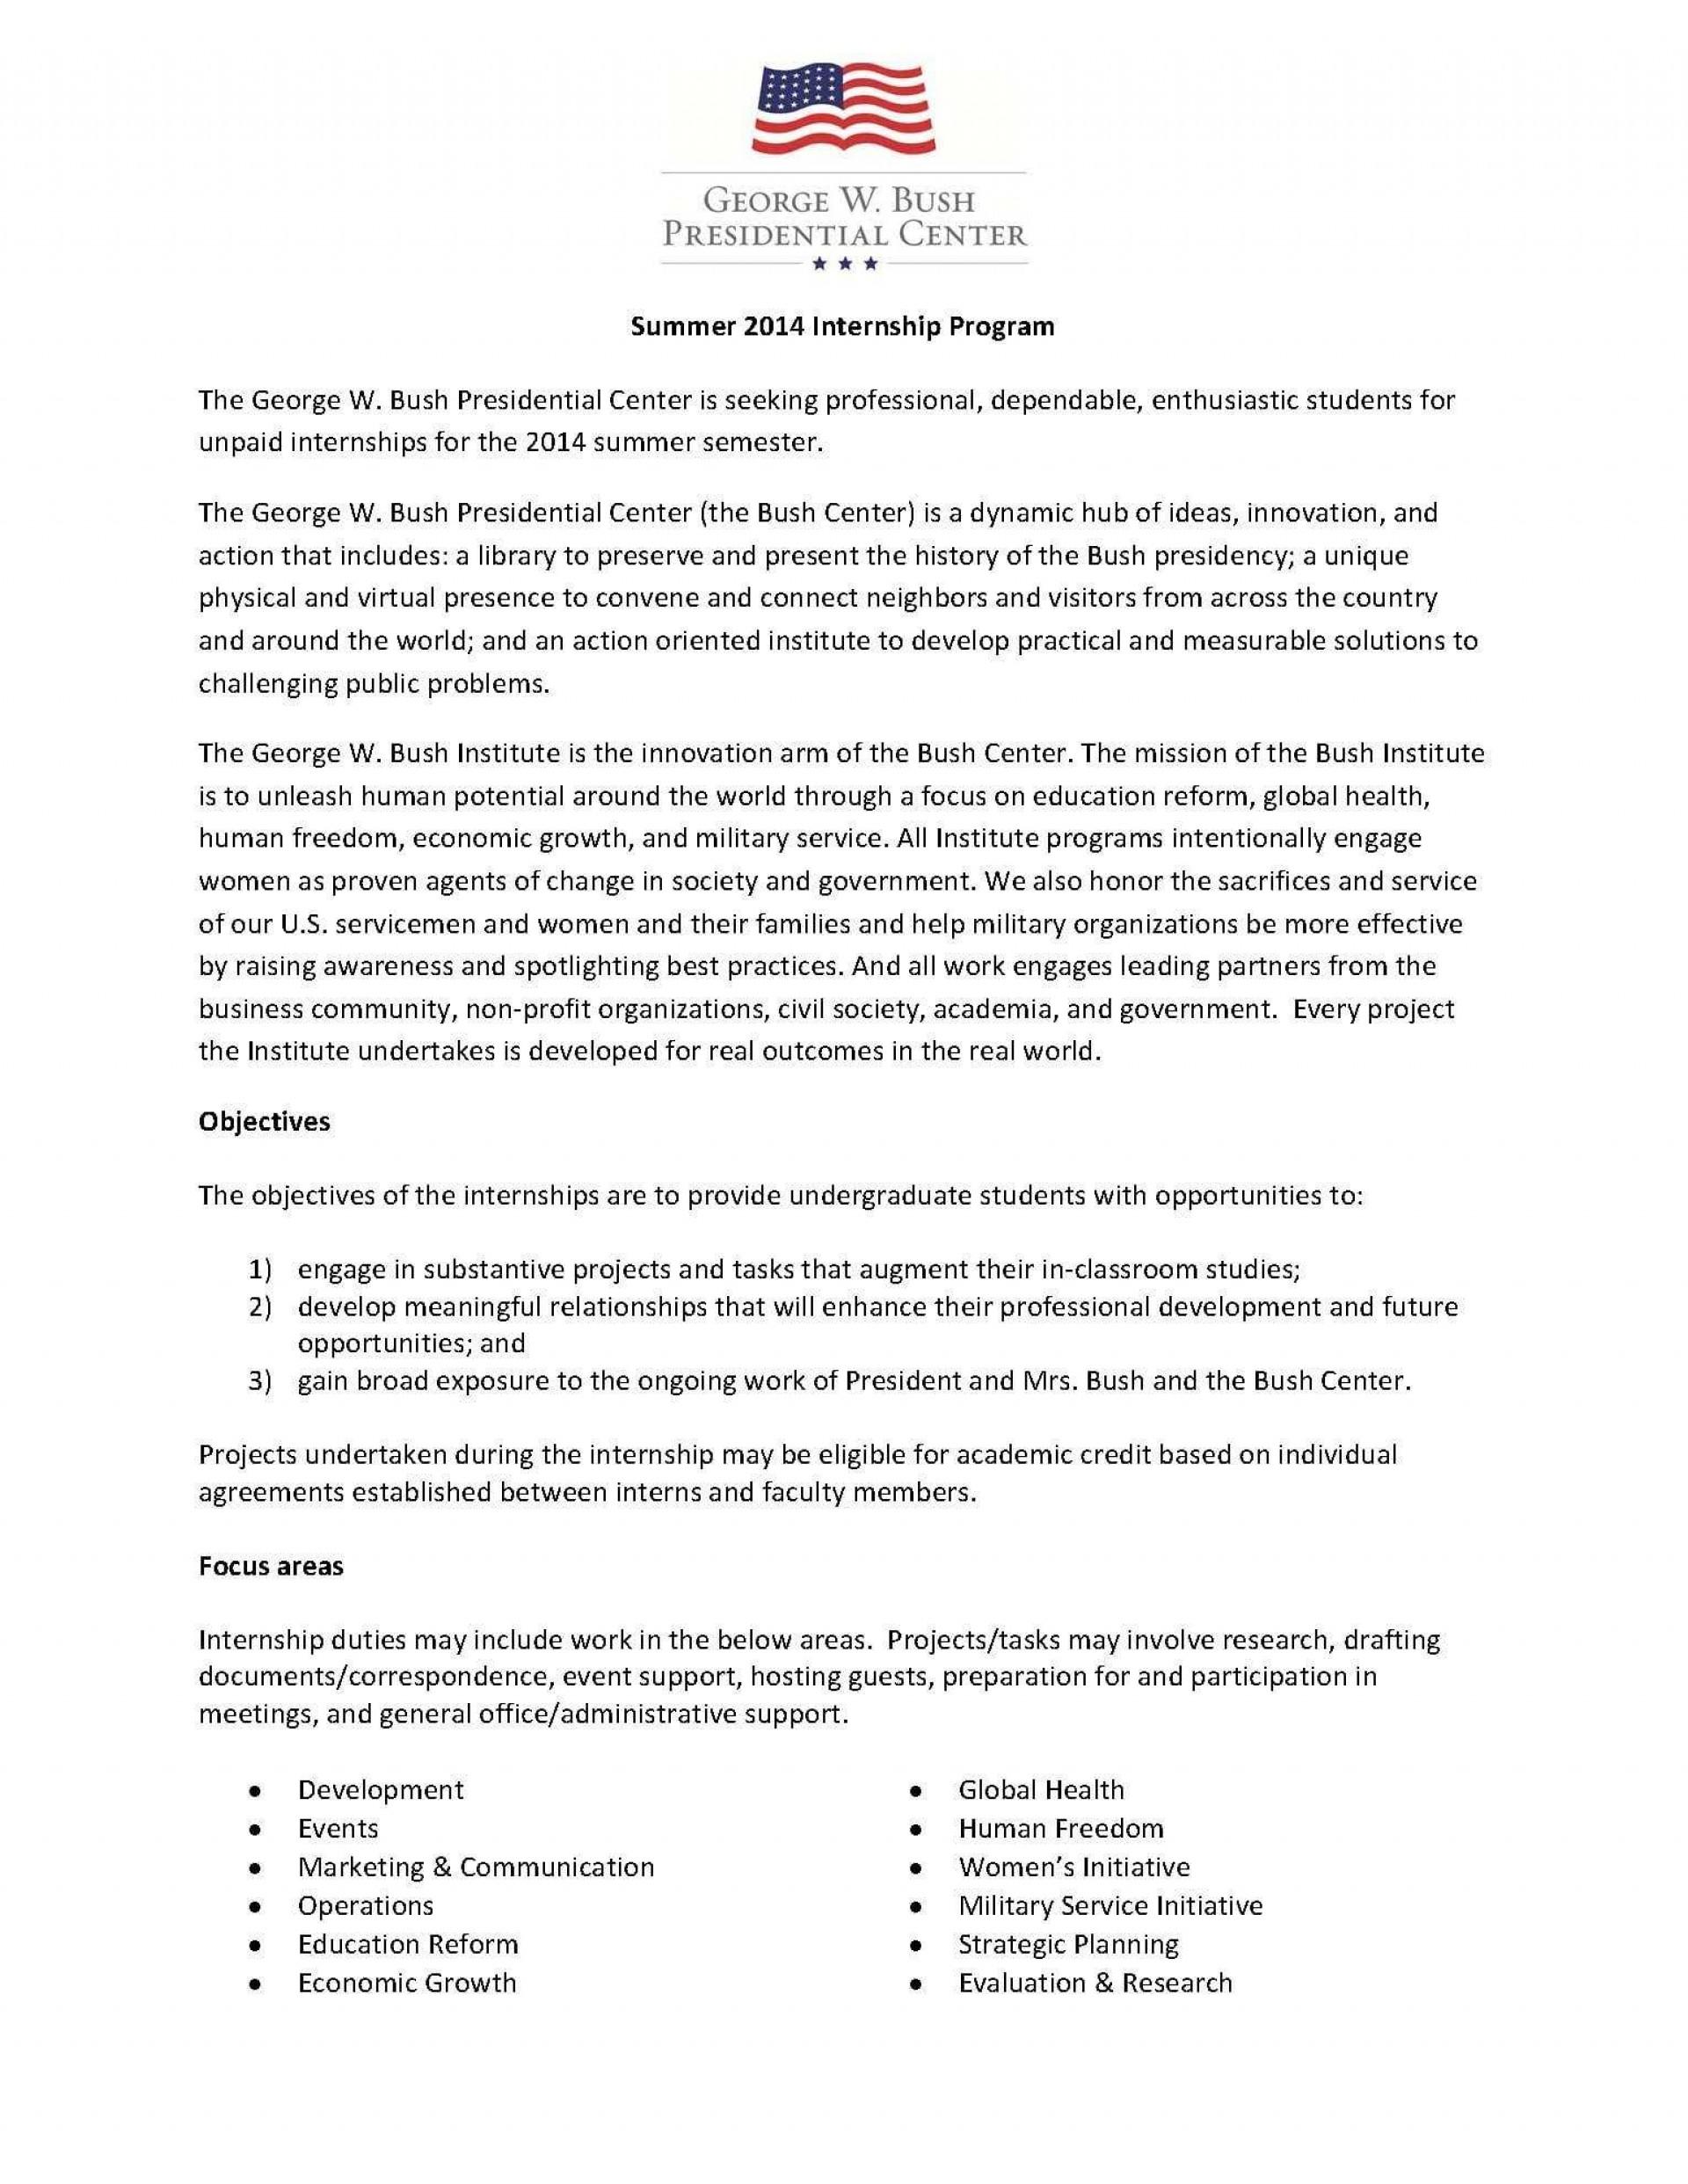 016 Descriptive Essay Topics Internship Program Summer 2014 Page 1 Exceptional Writing For Ibps Po Mains High School Students Prompts 1920